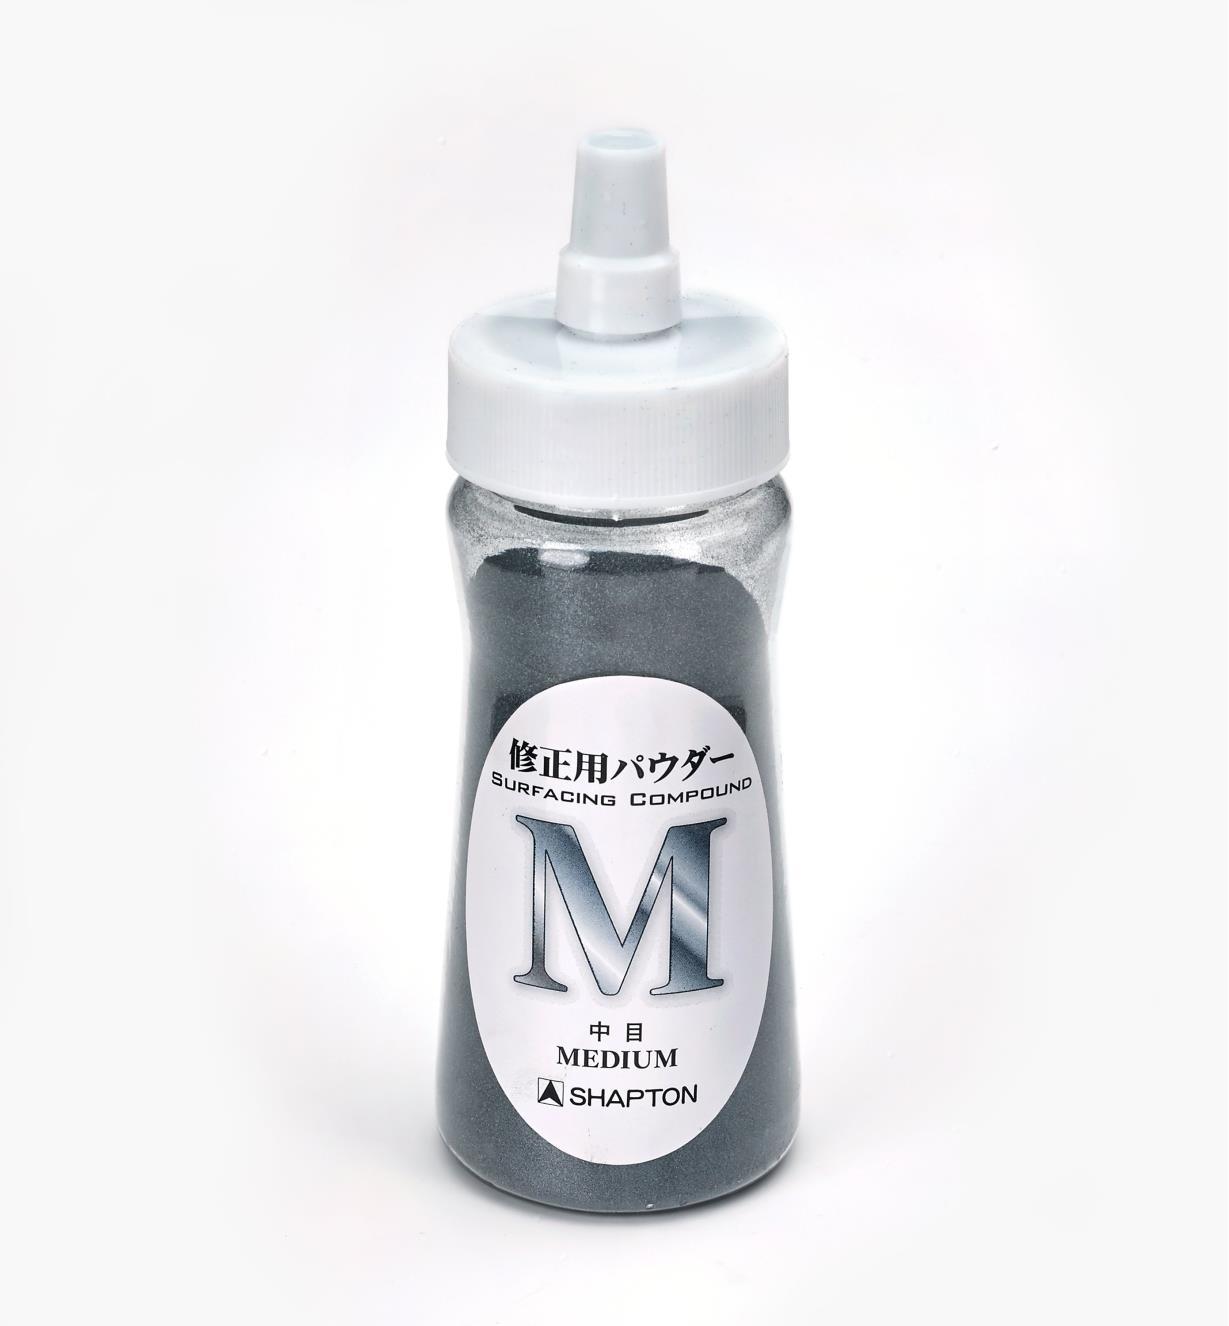 61M0402 - Shapton Medium Lapping Powder, 120ml (4oz)